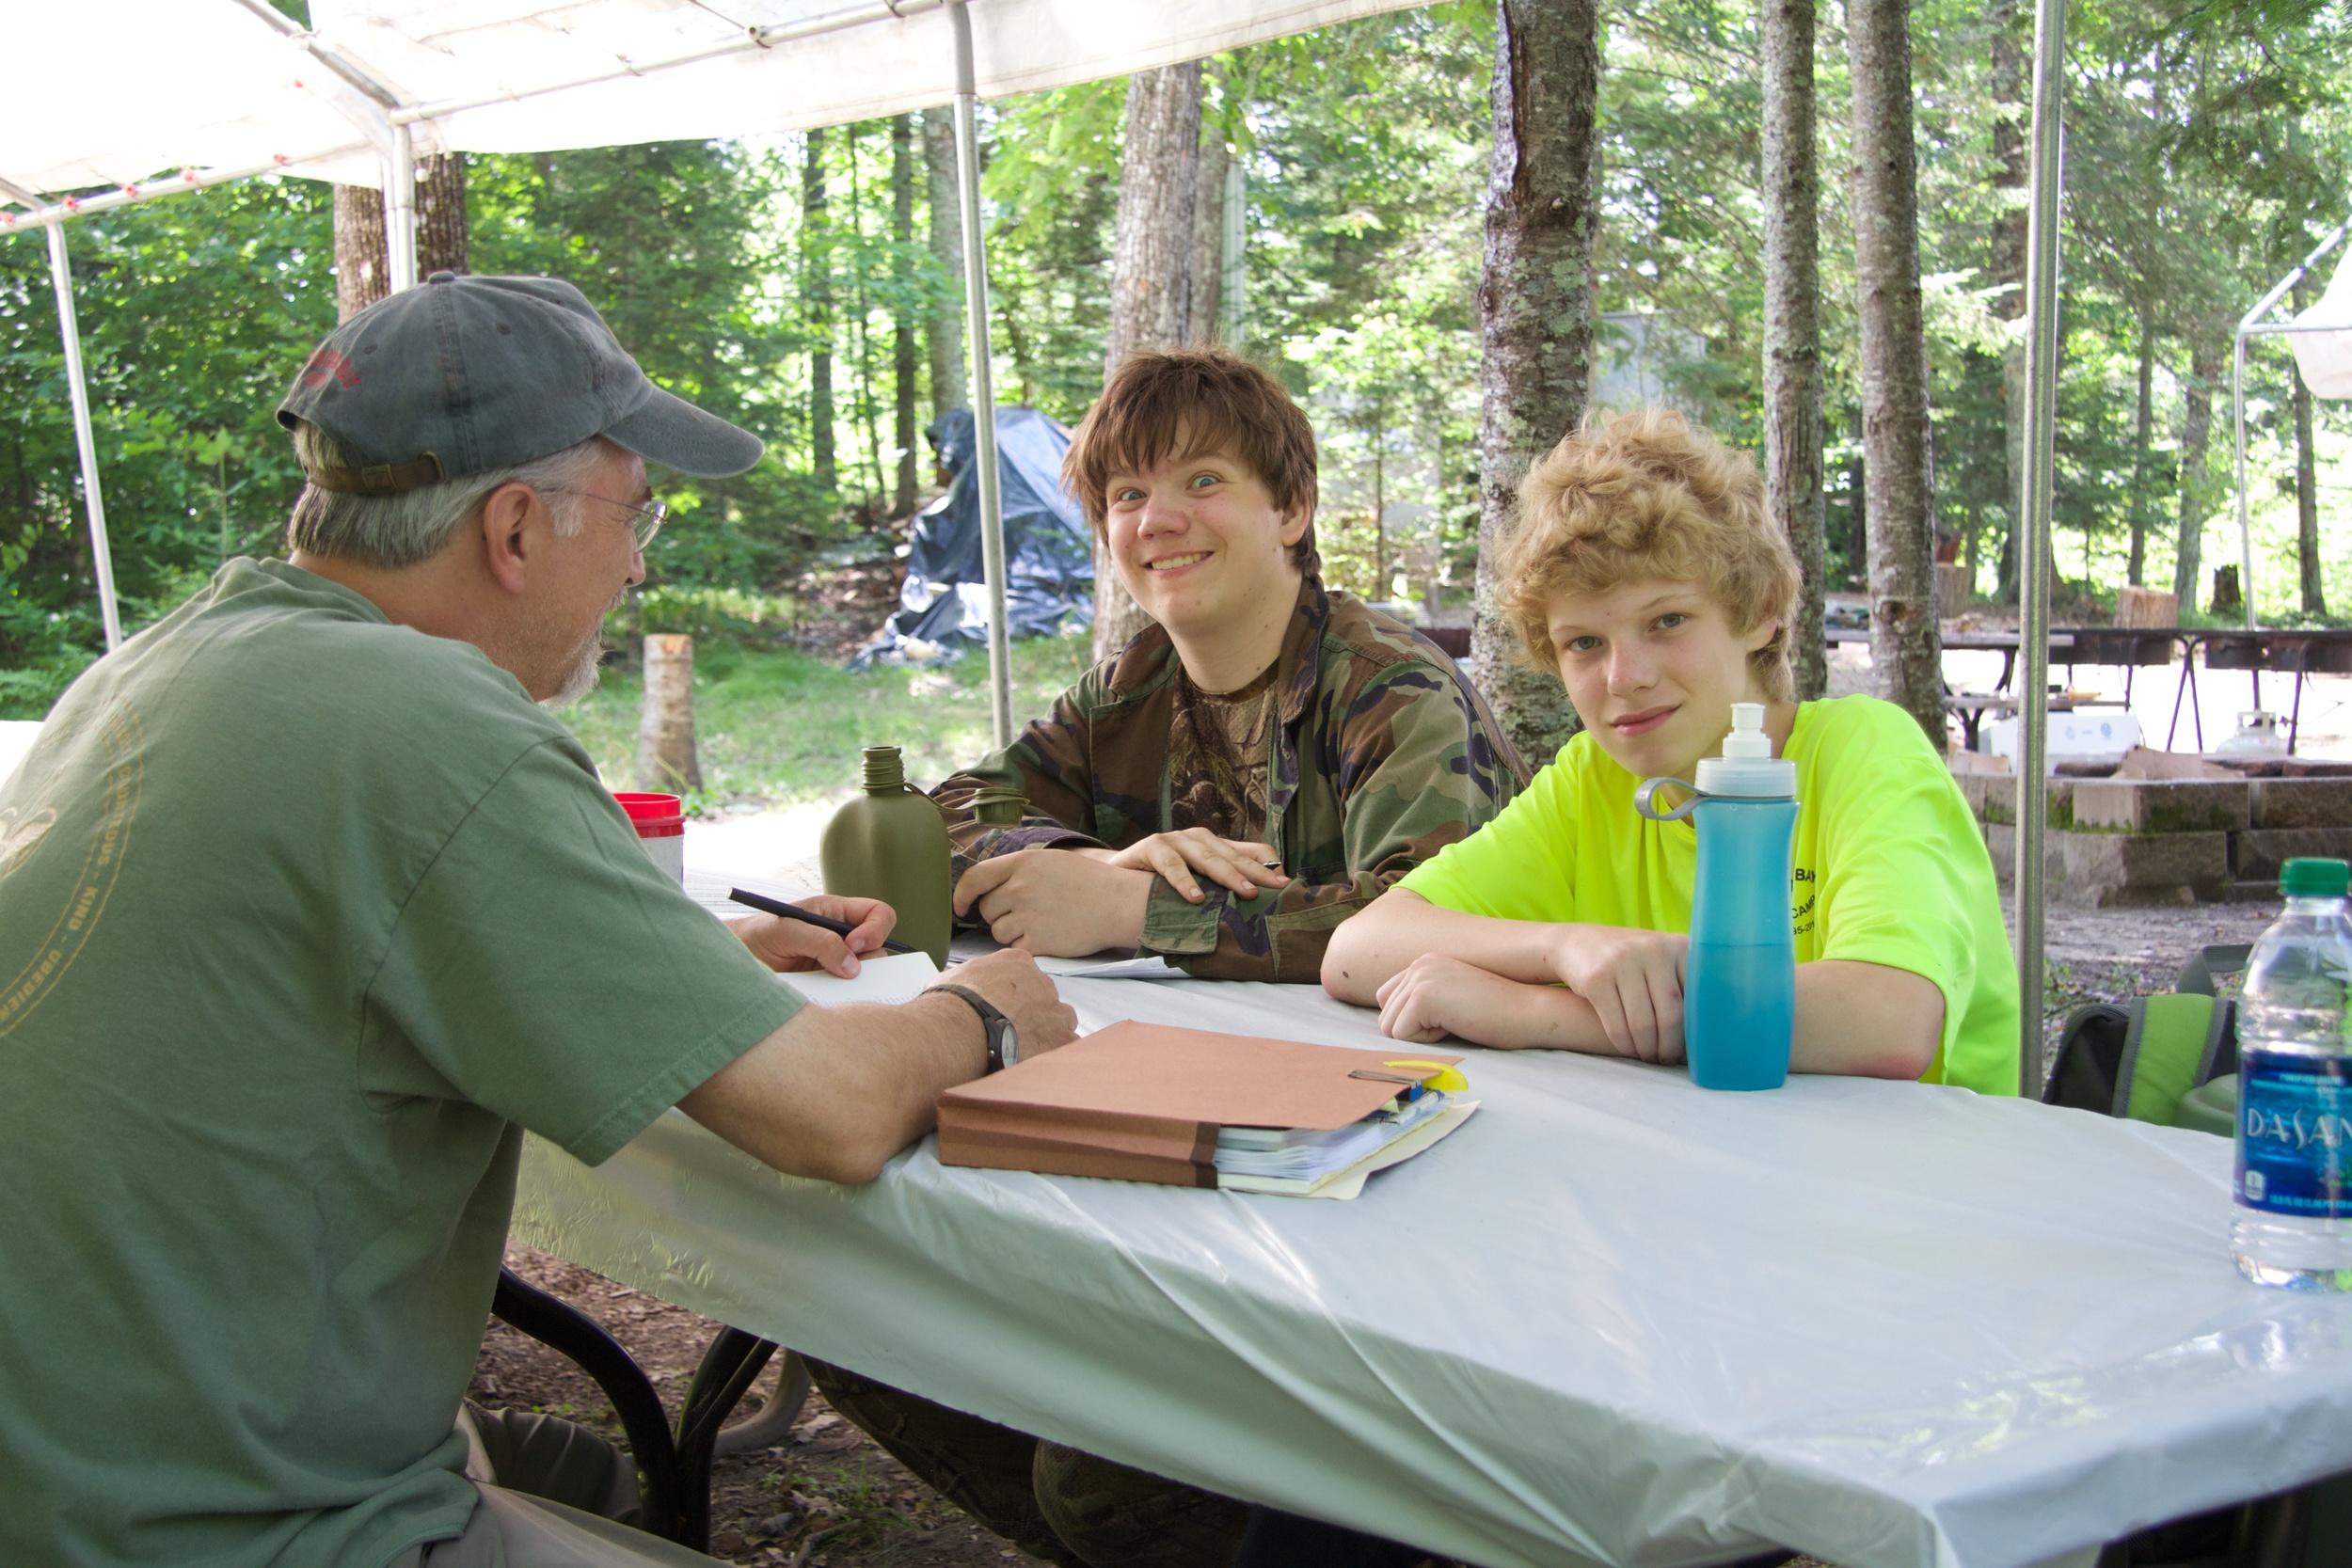 2014 Camp 2 532014 Camp 2 36IMG_0036.jpg